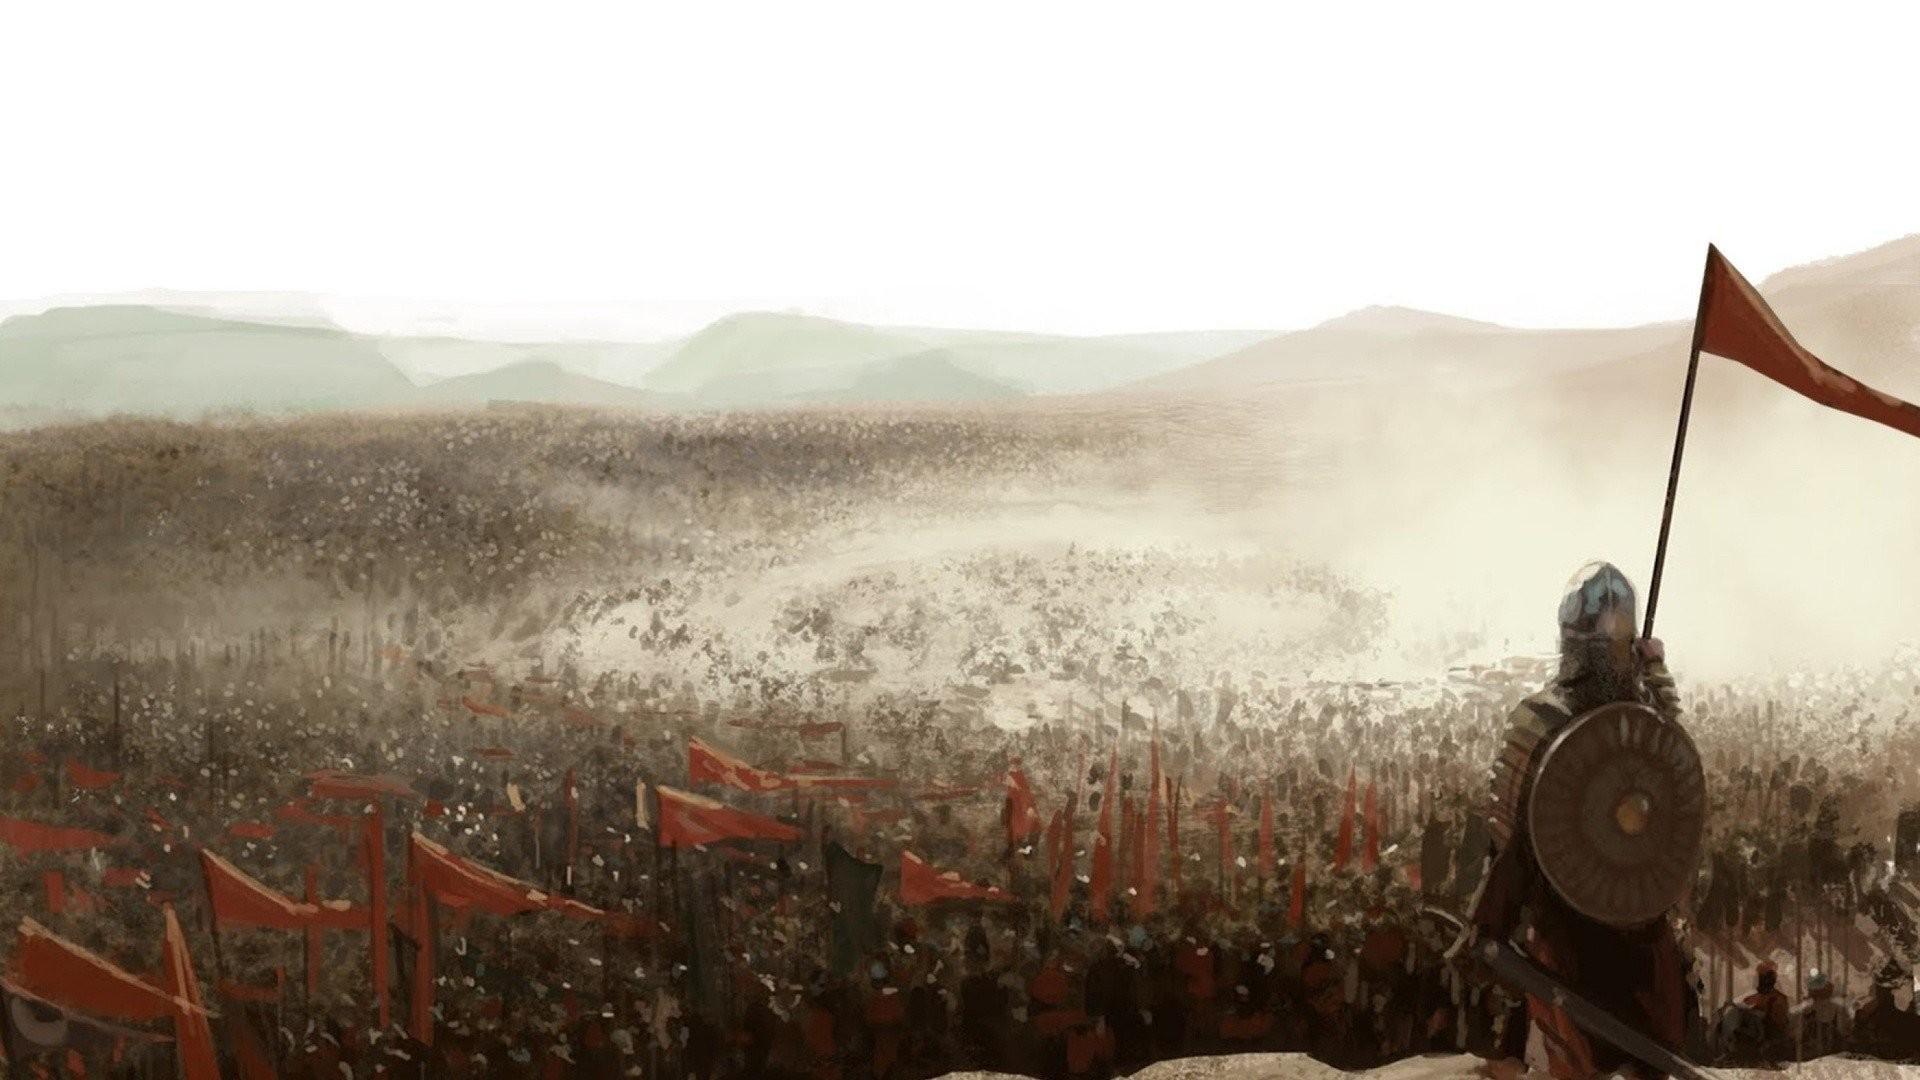 Soldiers war fantasy art Kingdom of Heaven battles wallpaper | |  275573 | WallpaperUP